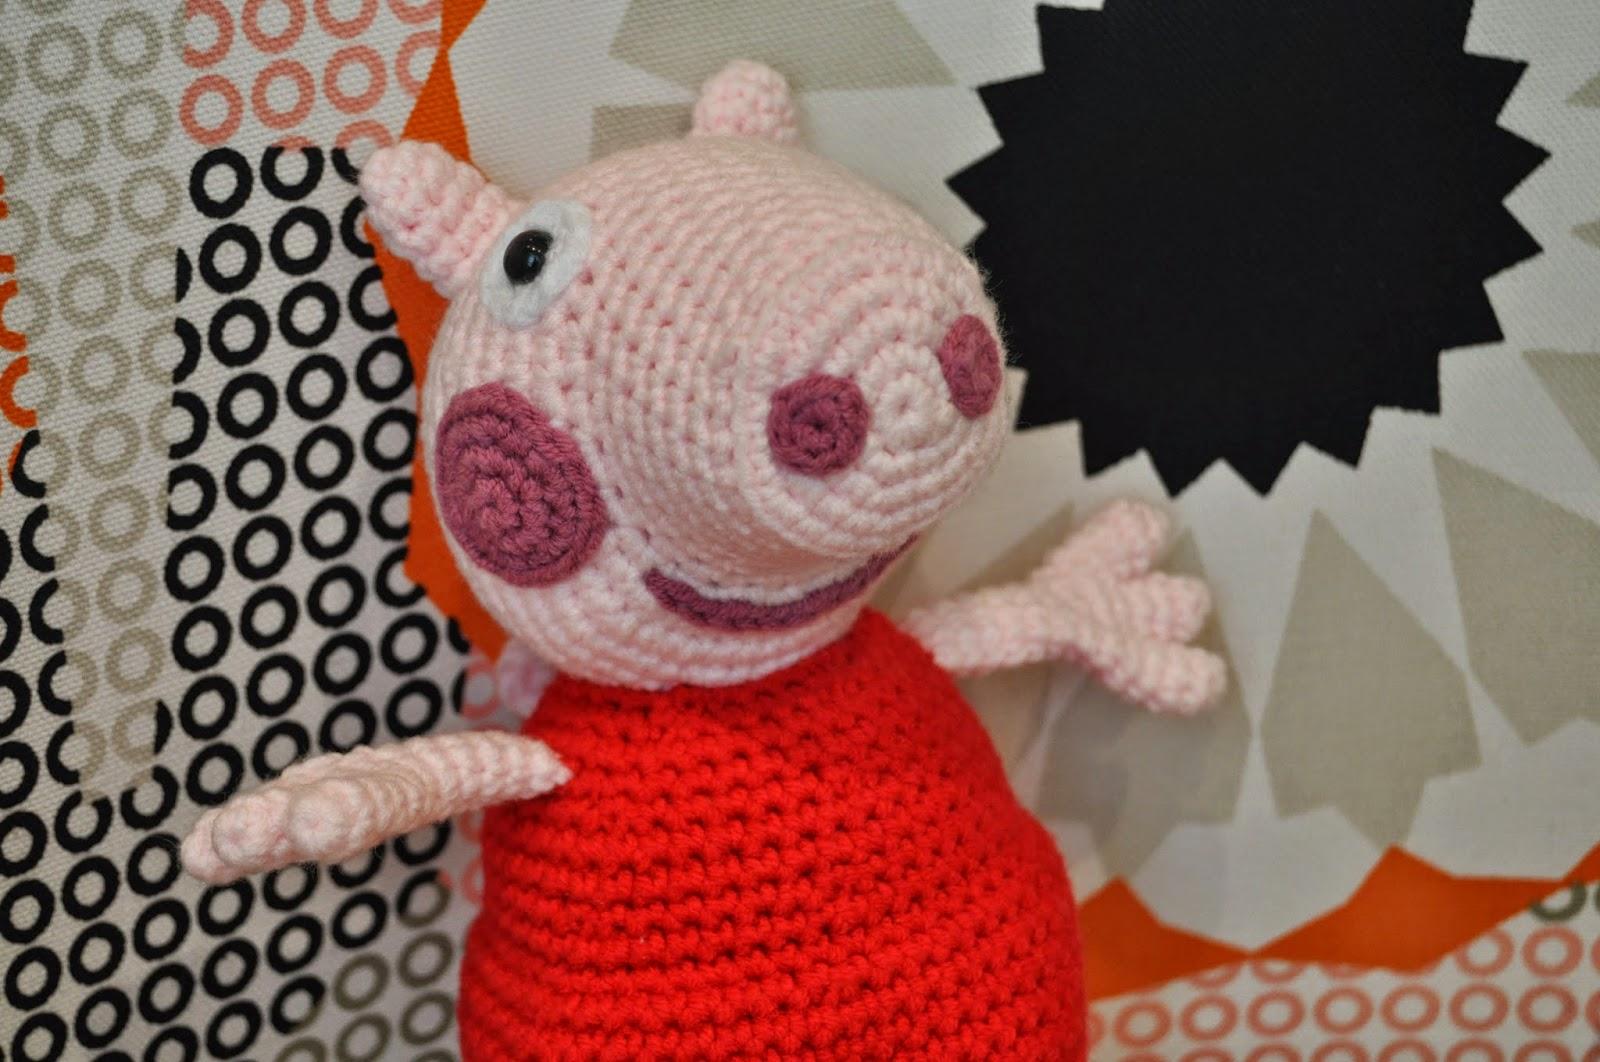 PEPPA PIG AMIGURUMI PATRÓN GRATIS - YouTube | 1062x1600